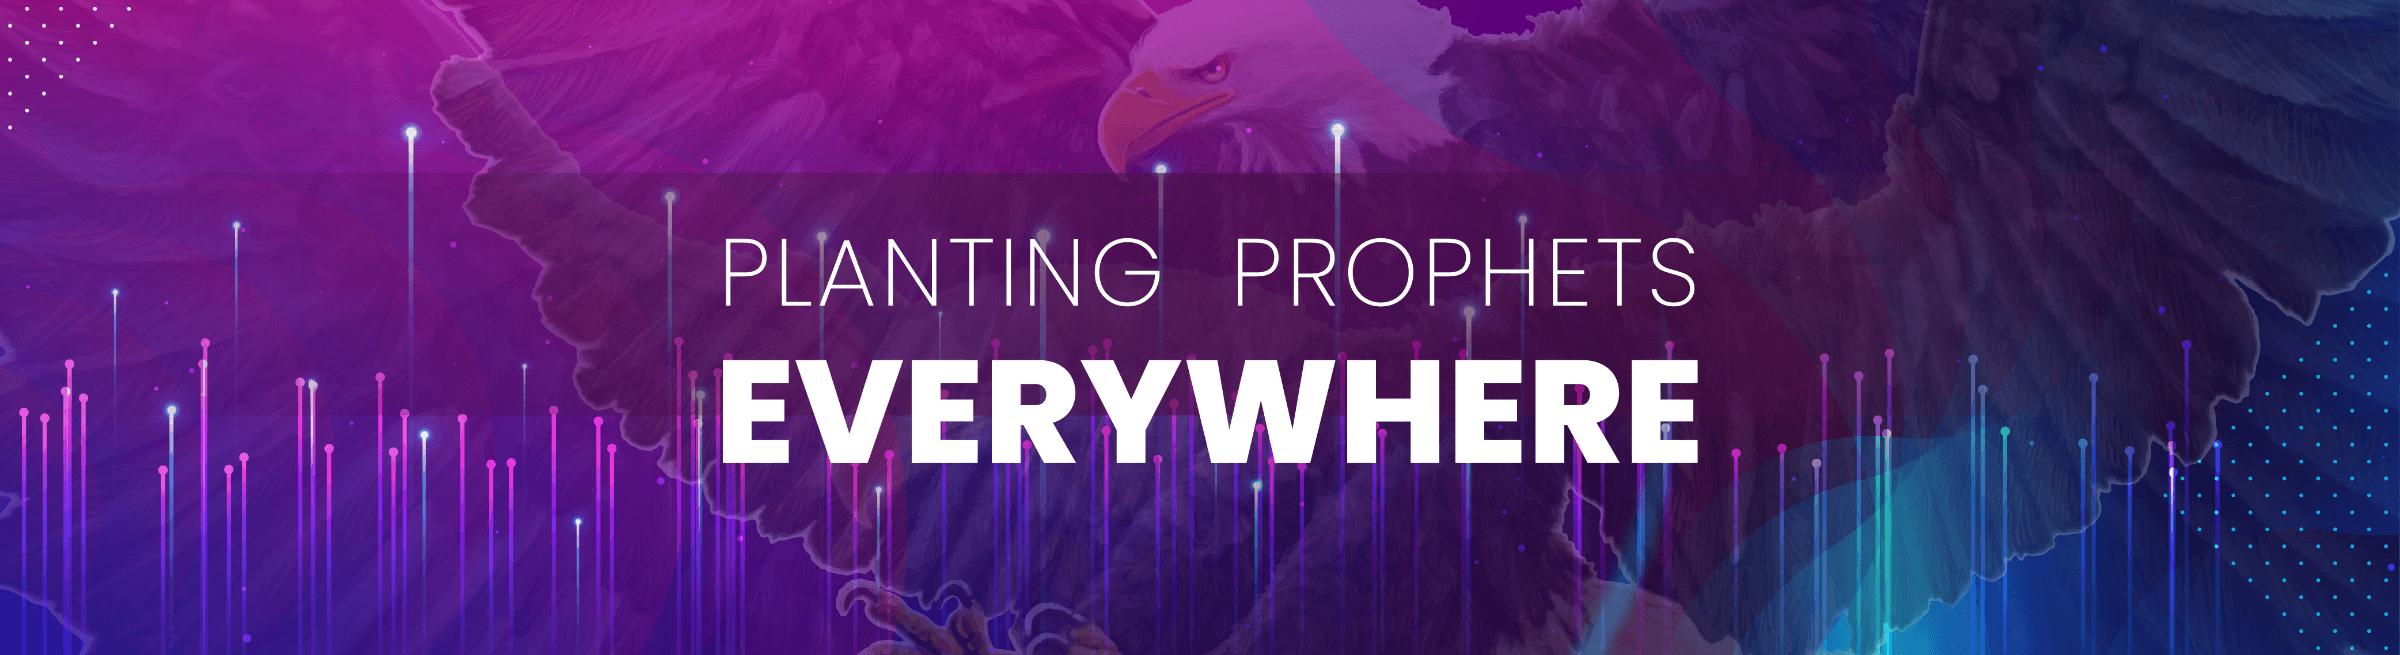 Planting Prophets Everywhere